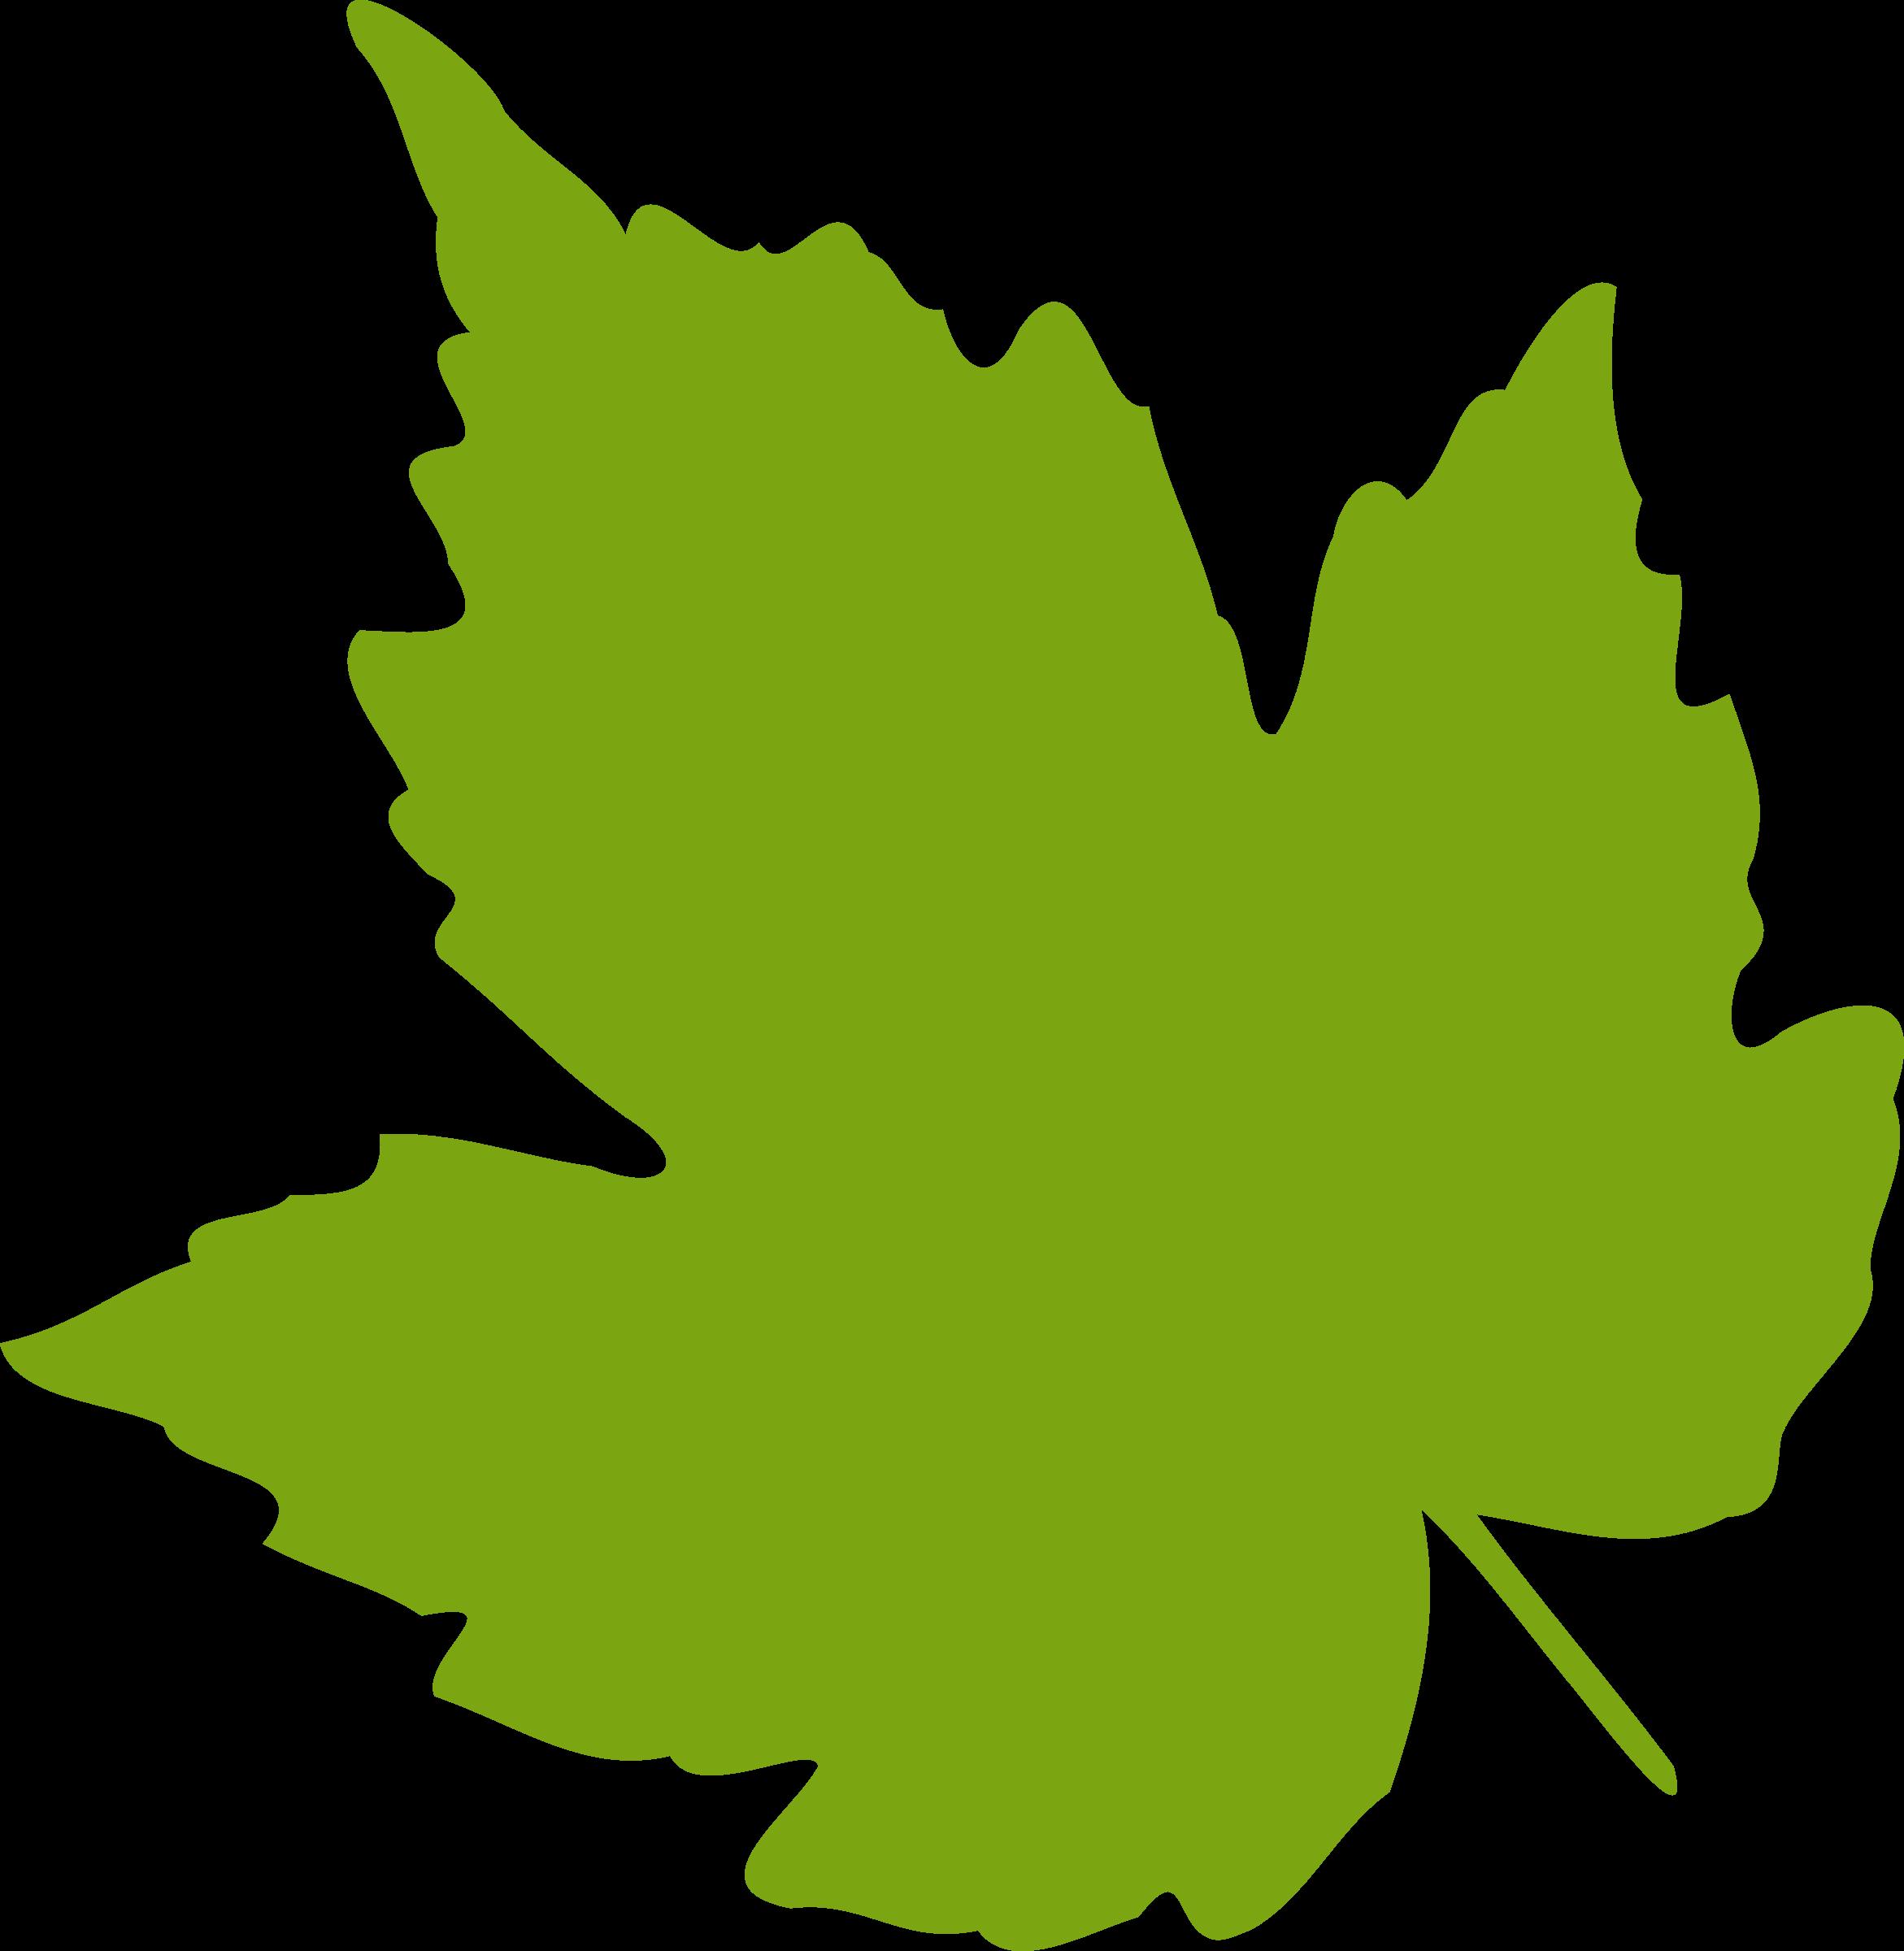 Leaves clipart cartoon.